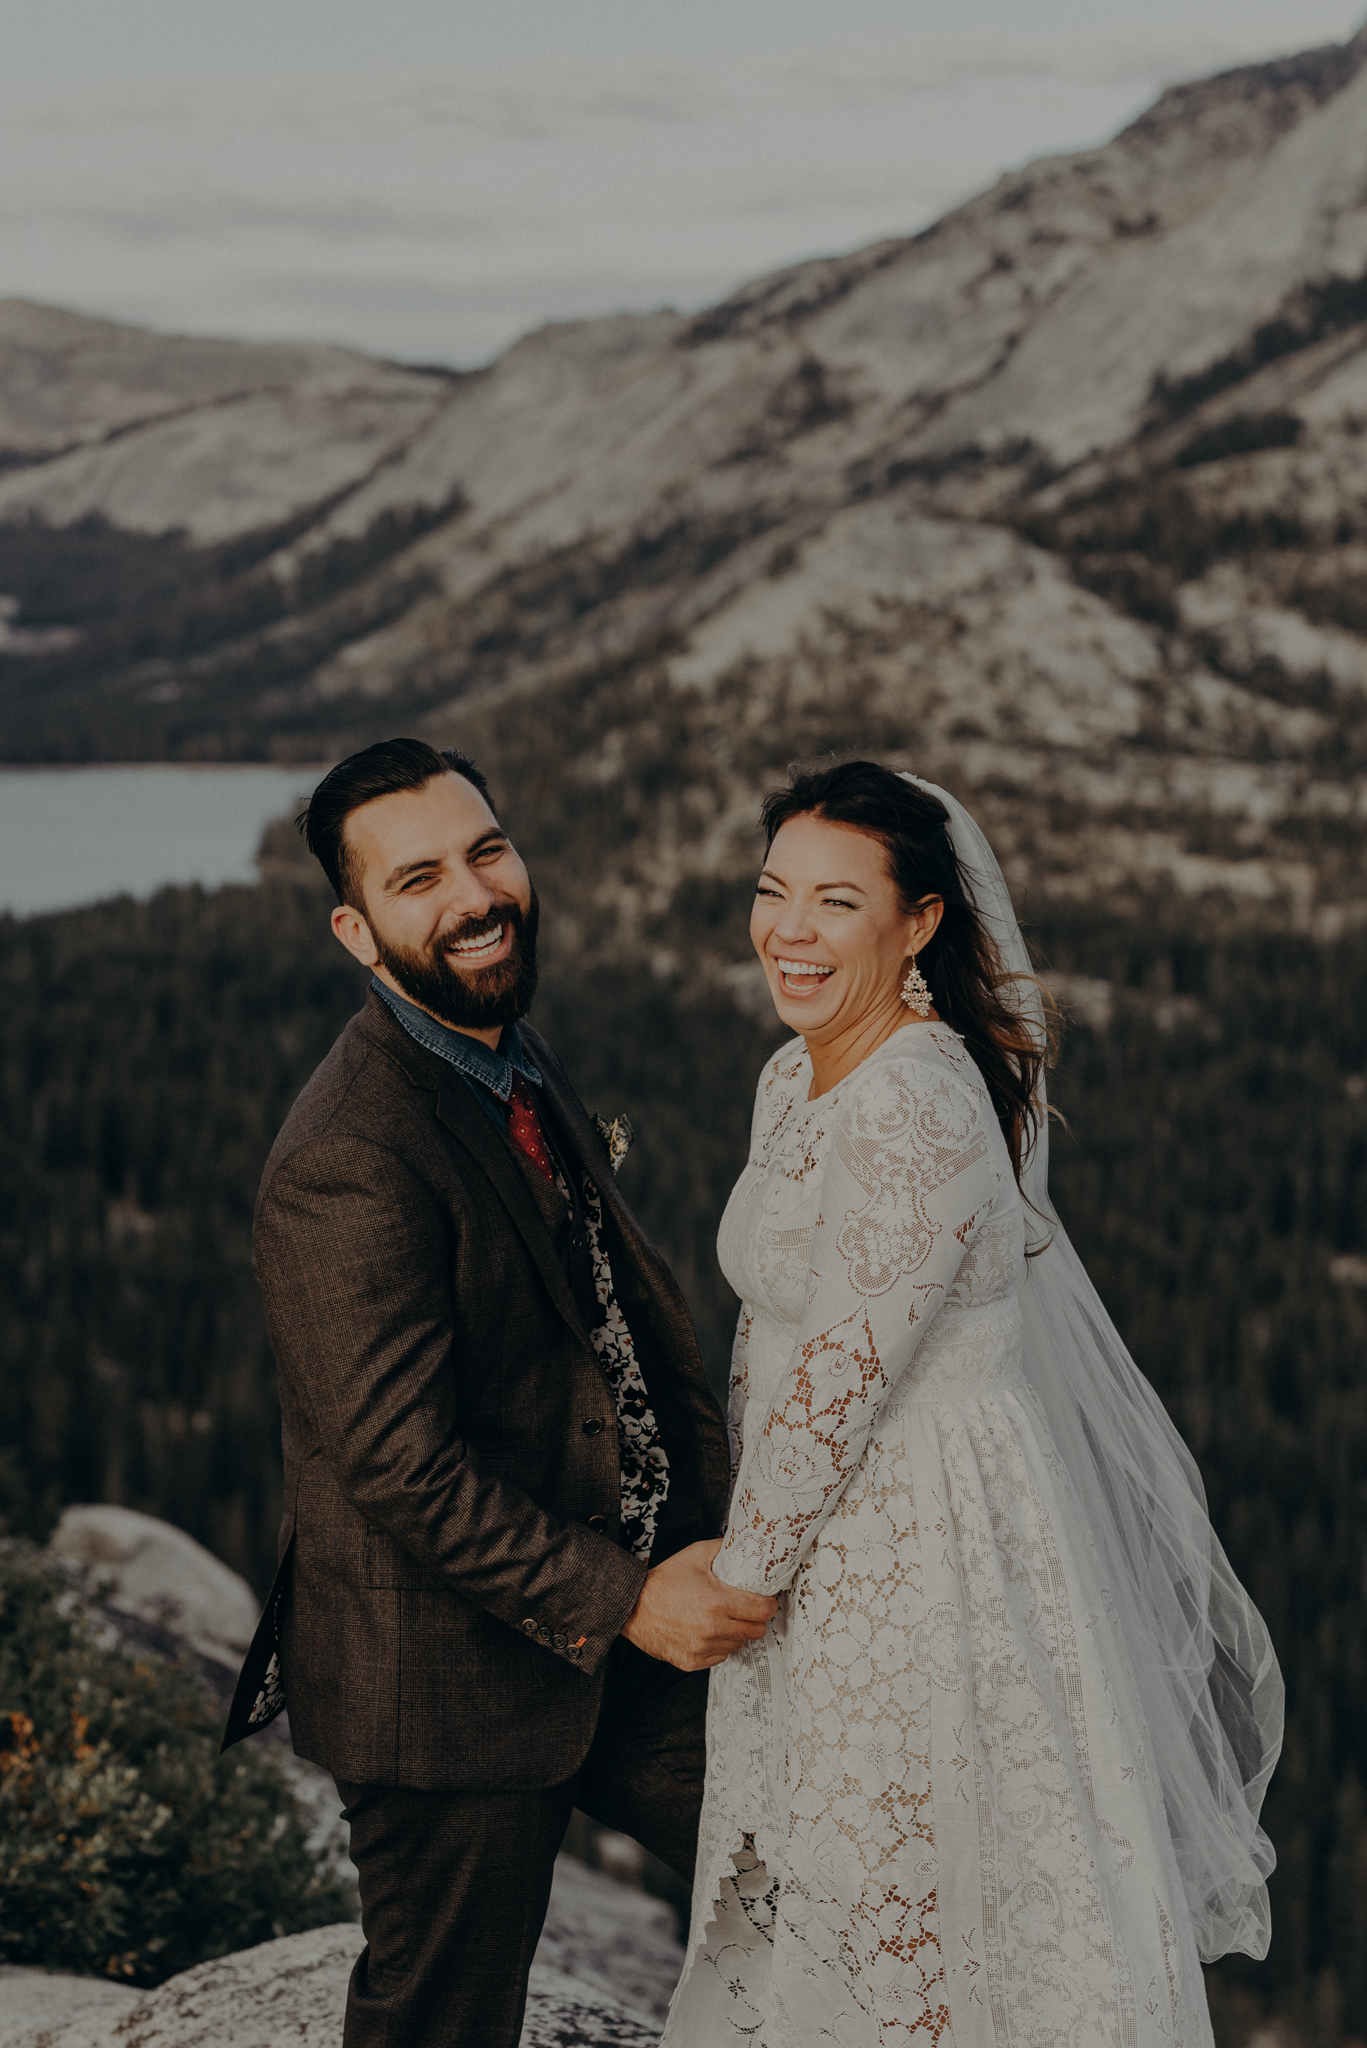 Yosemite Elopement Photographer - Evergreen Lodge Wedding Photographer - IsaiahAndTaylor.com-023.jpg